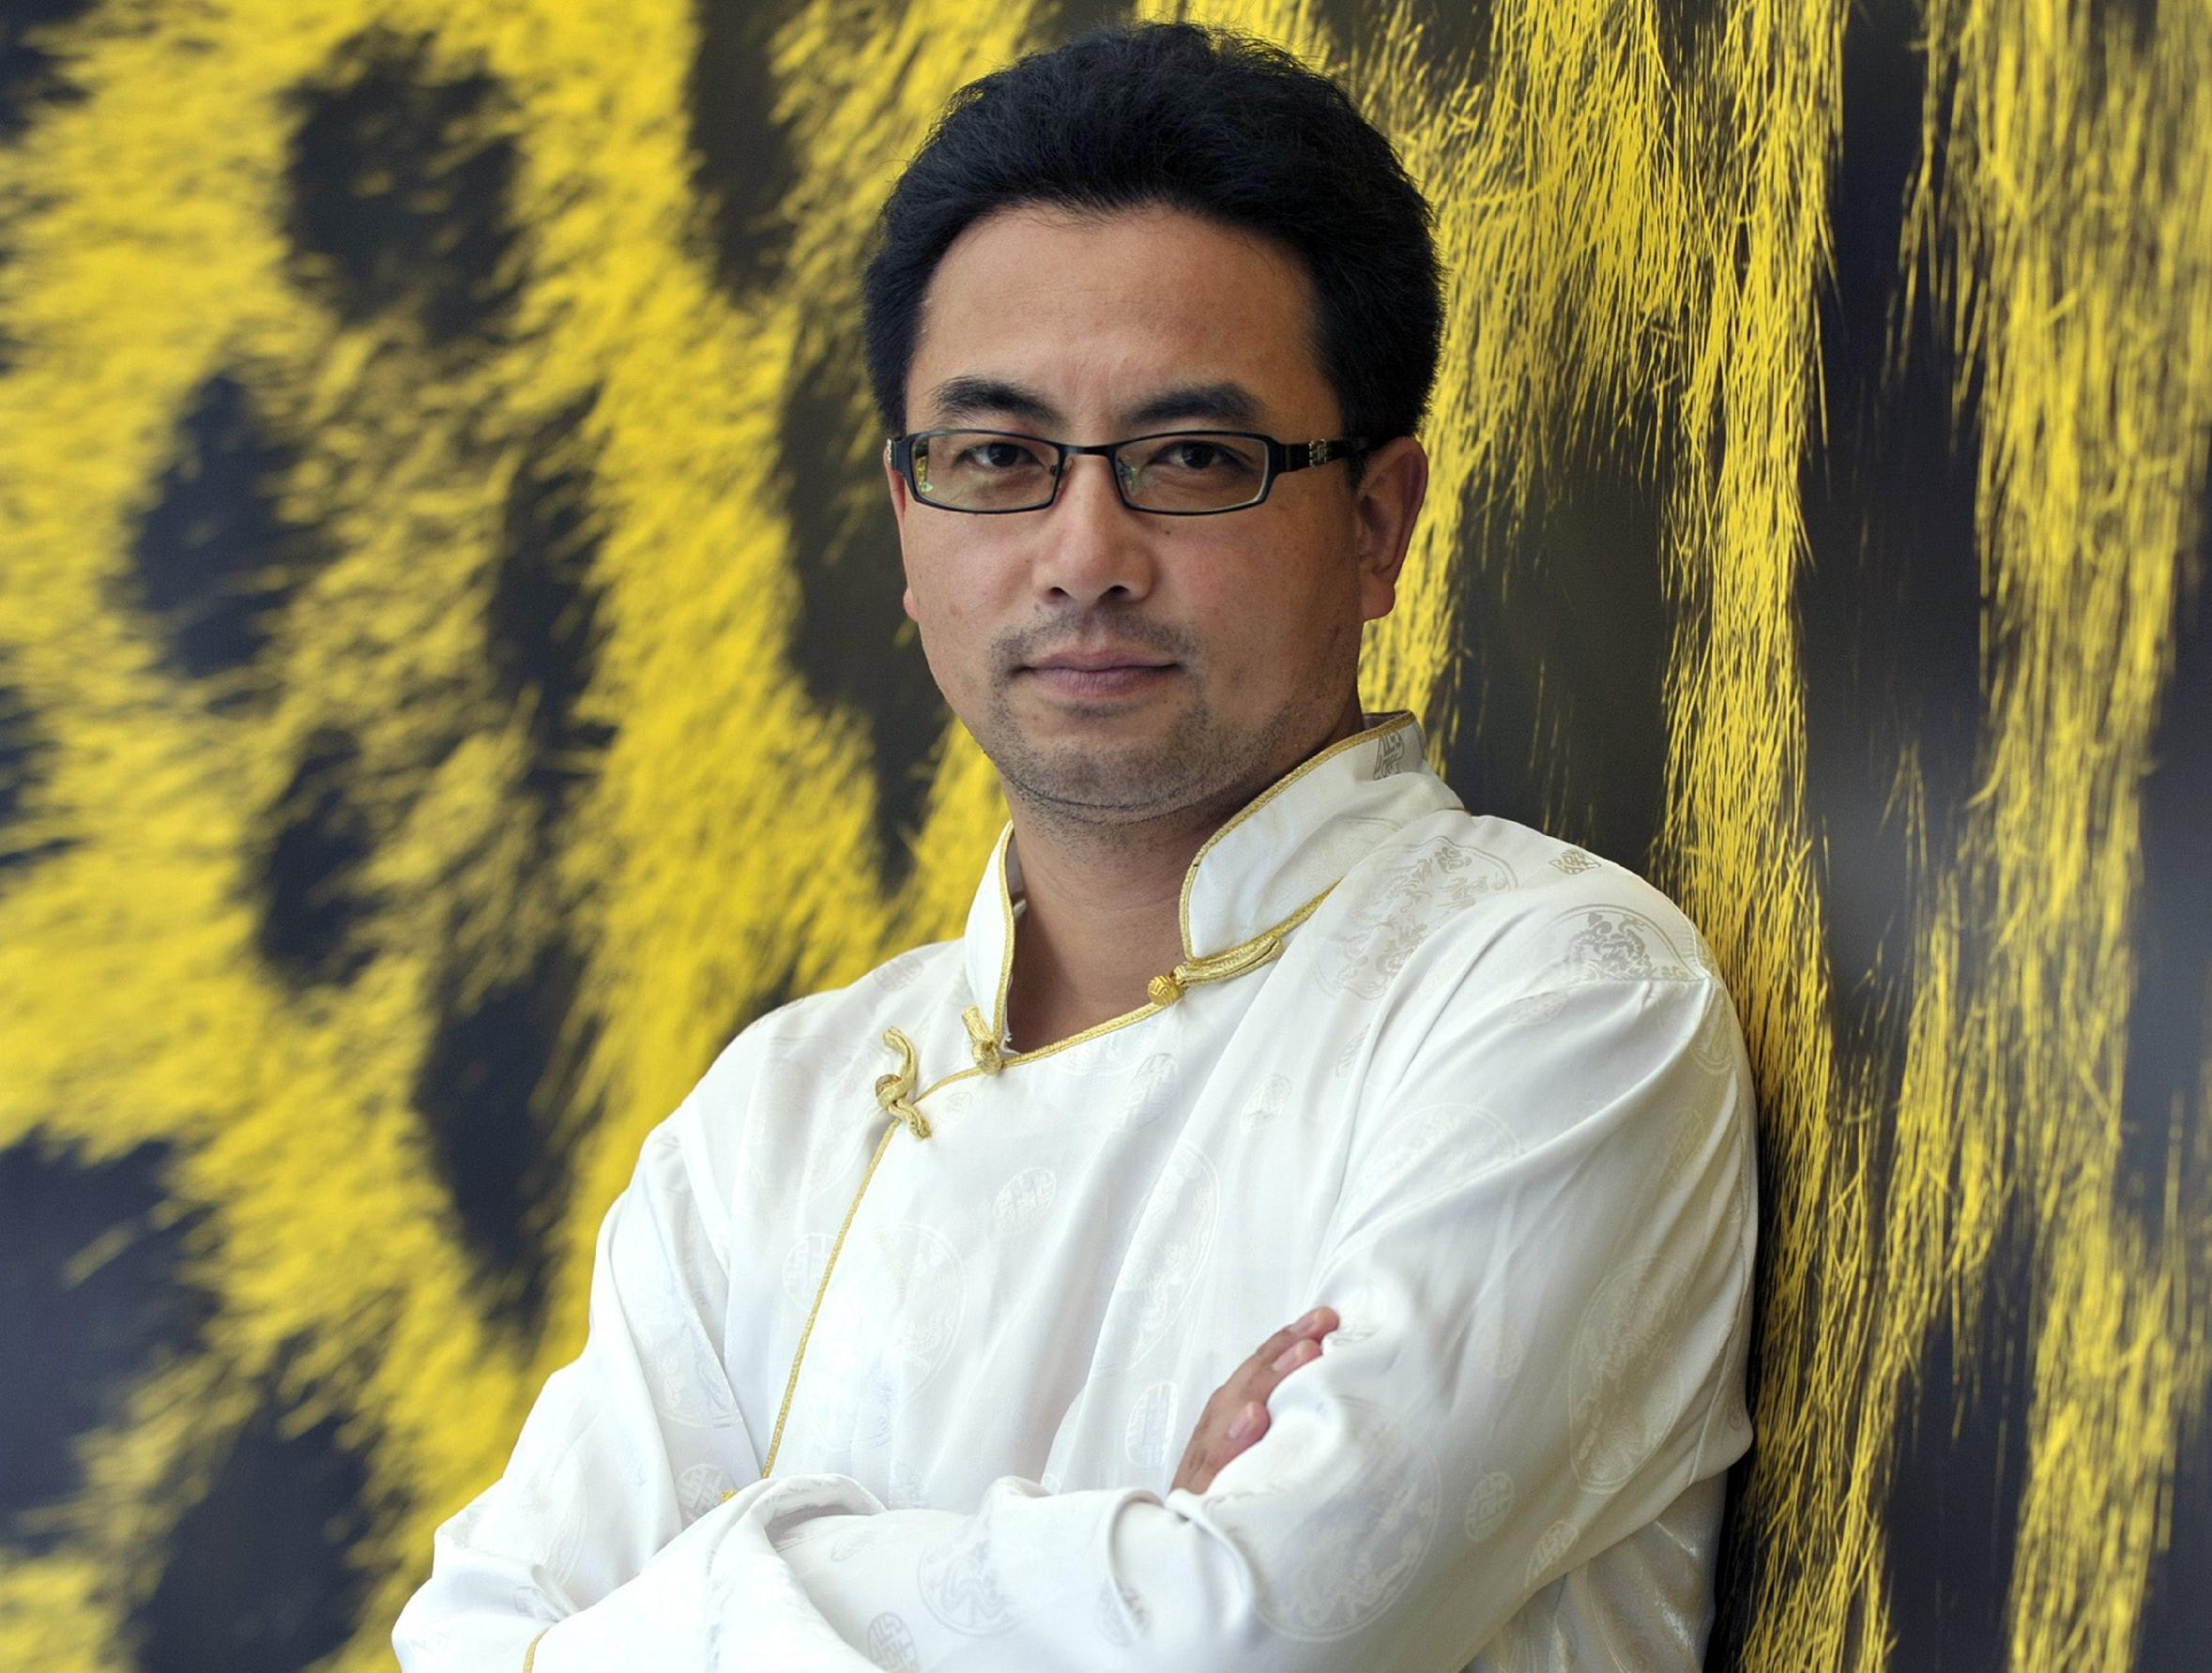 Tibetan director Pema Tseden hospitalized after scuffle